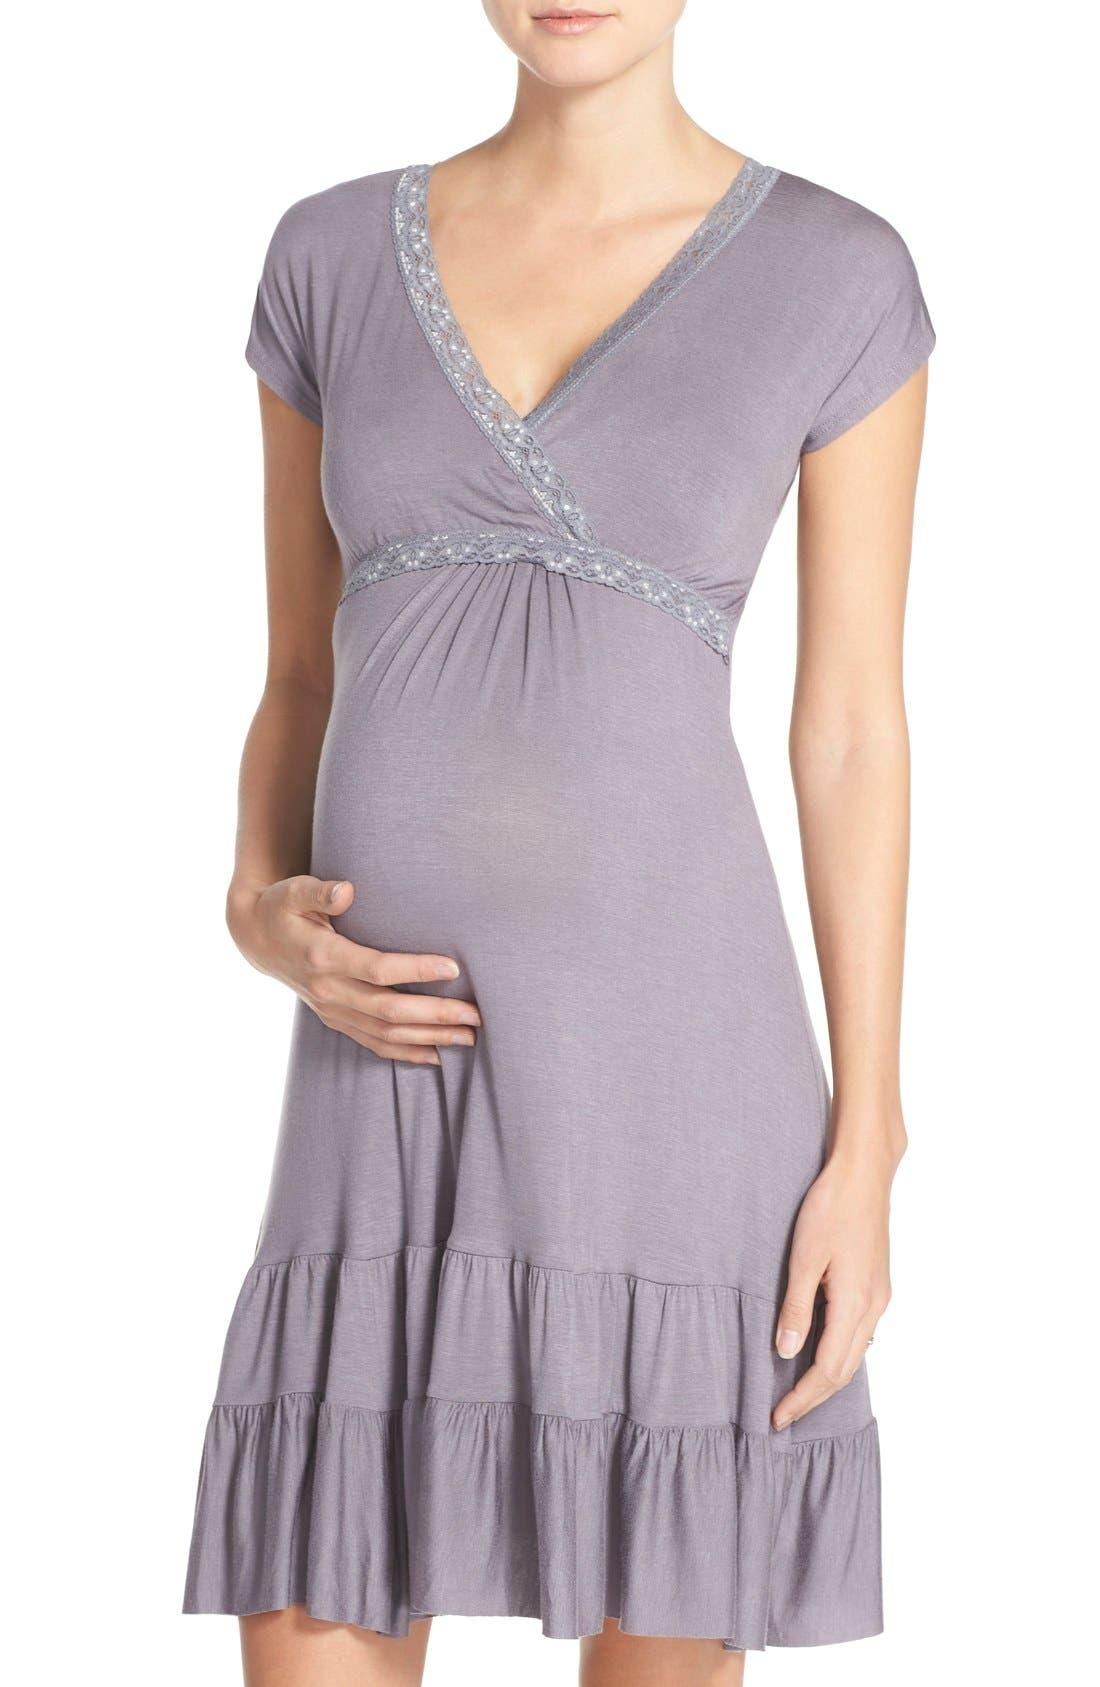 Belabumbum Ruffle Nursing Dress